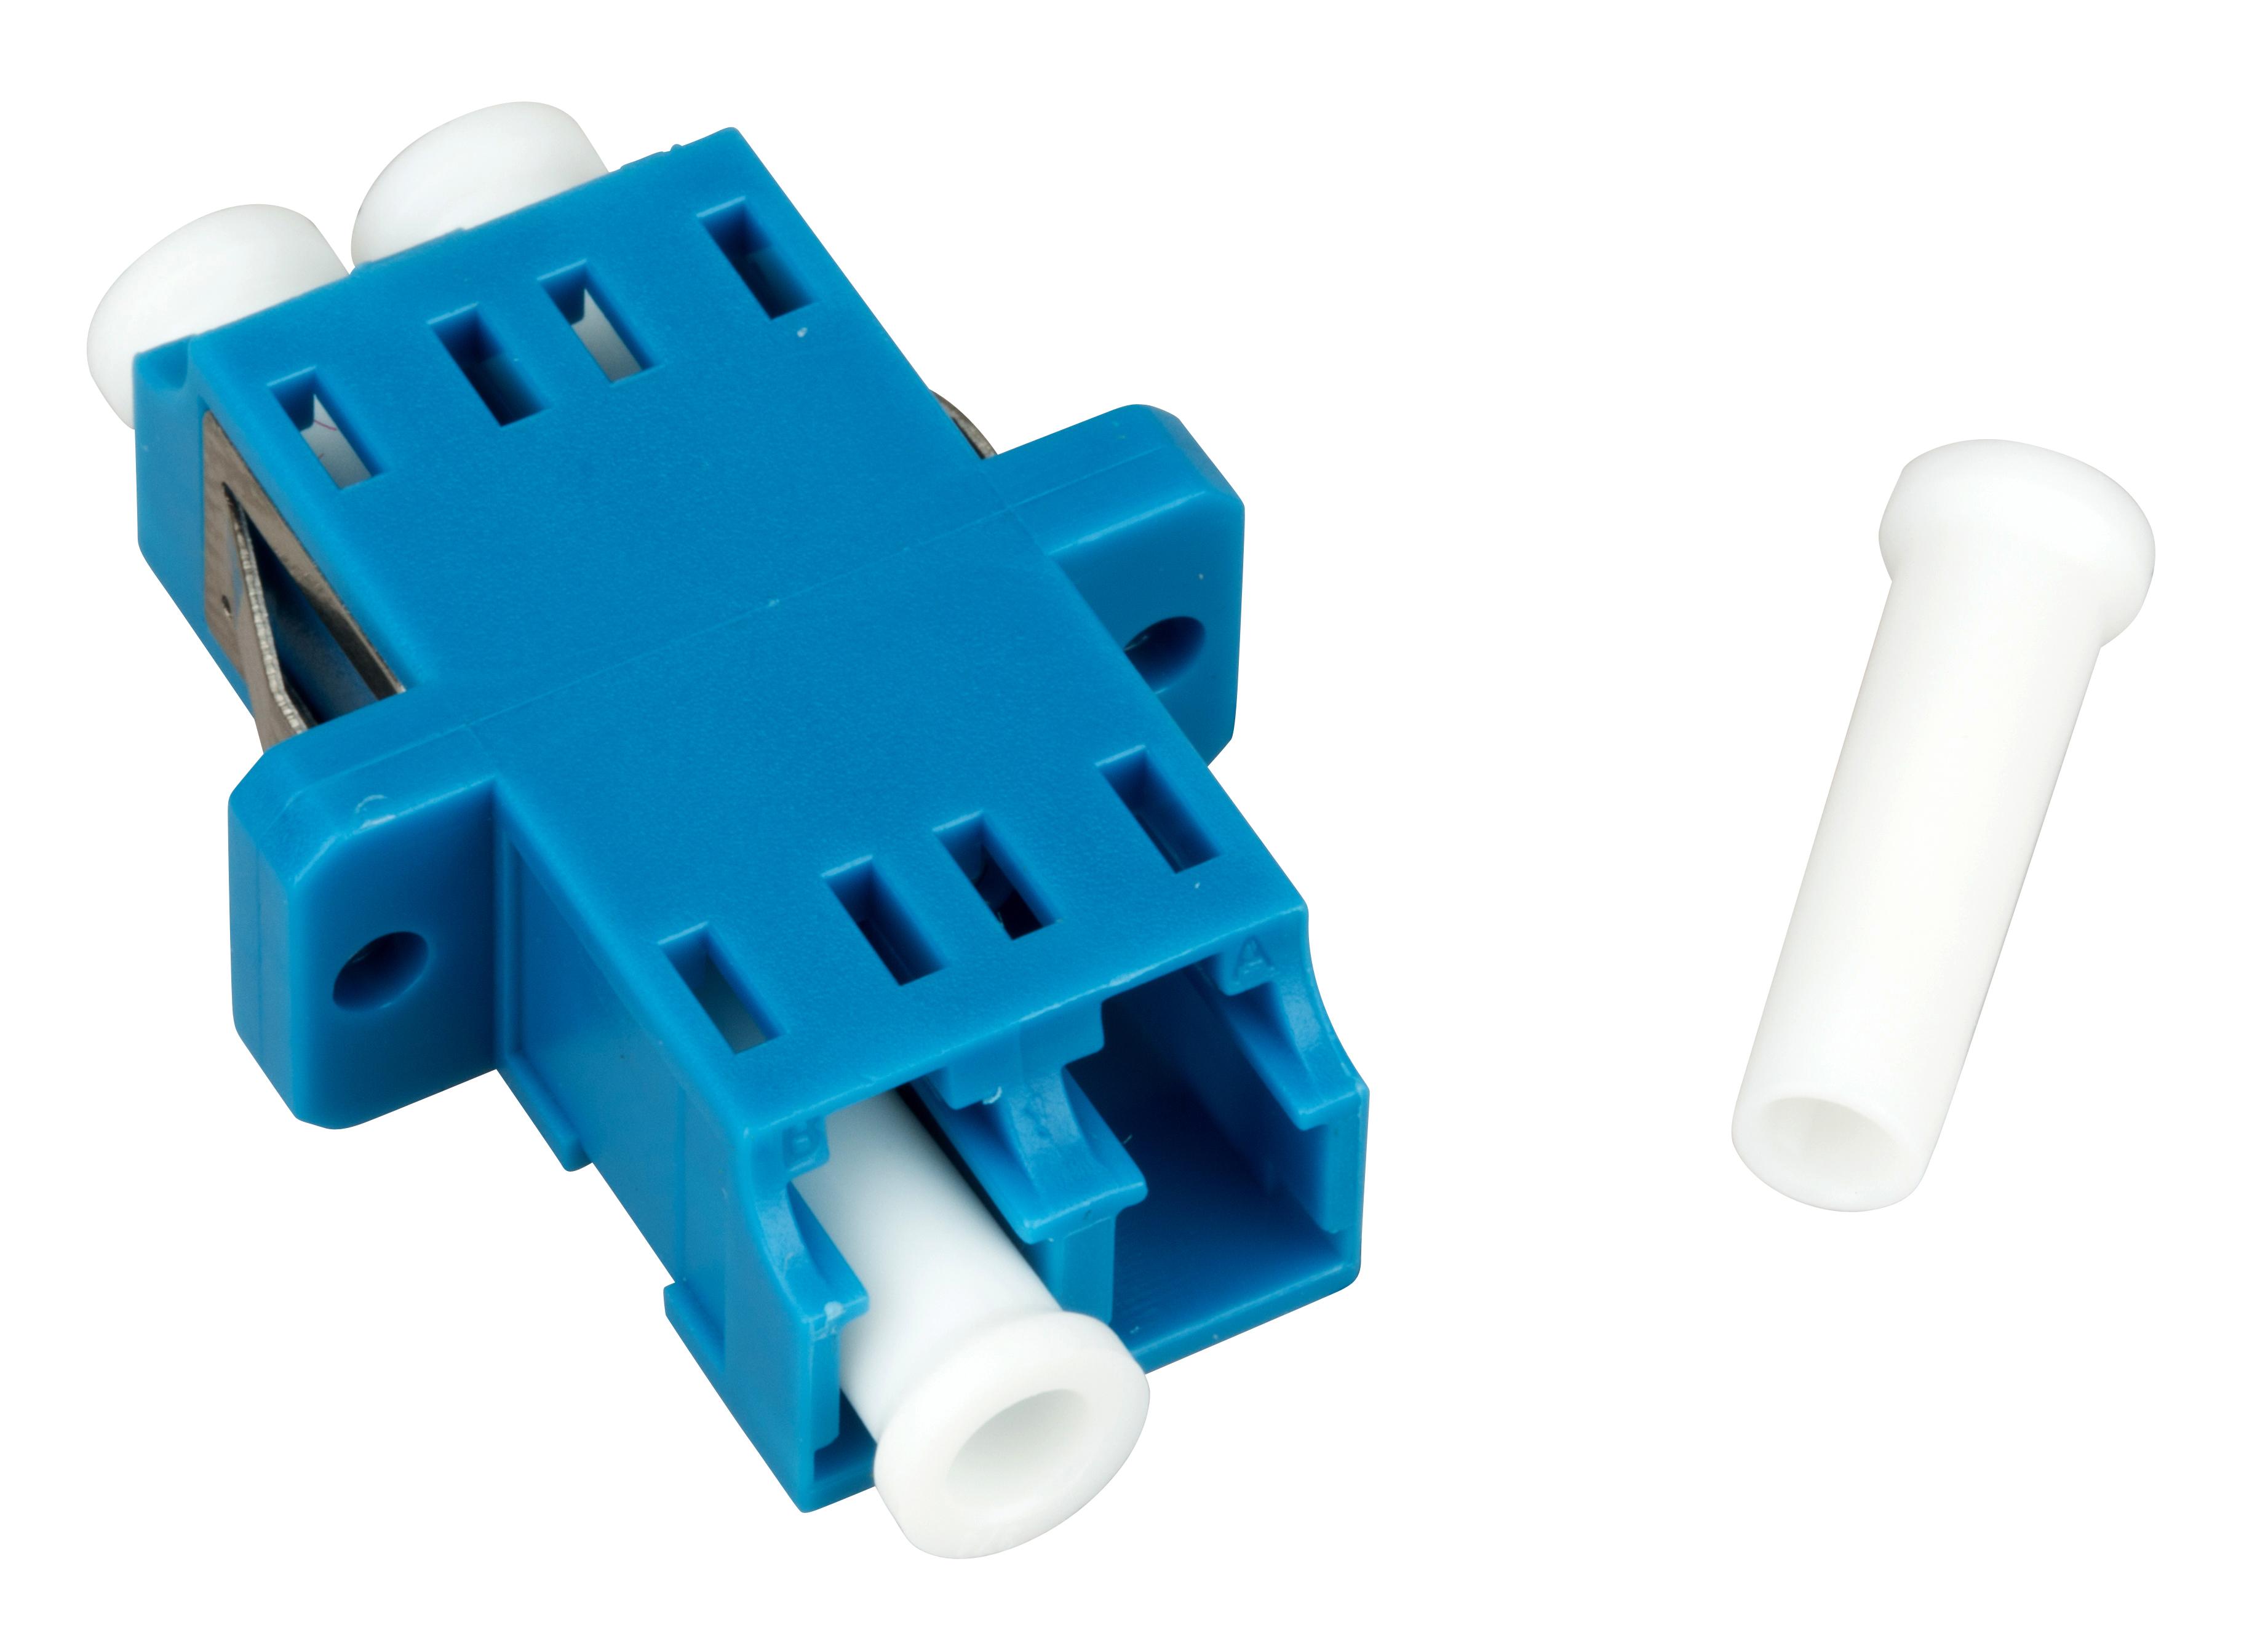 1 Stk LWL Kupplung LC-Duplex, Singlemode, zirc, Flansch, blau, ECO HMOLE00056